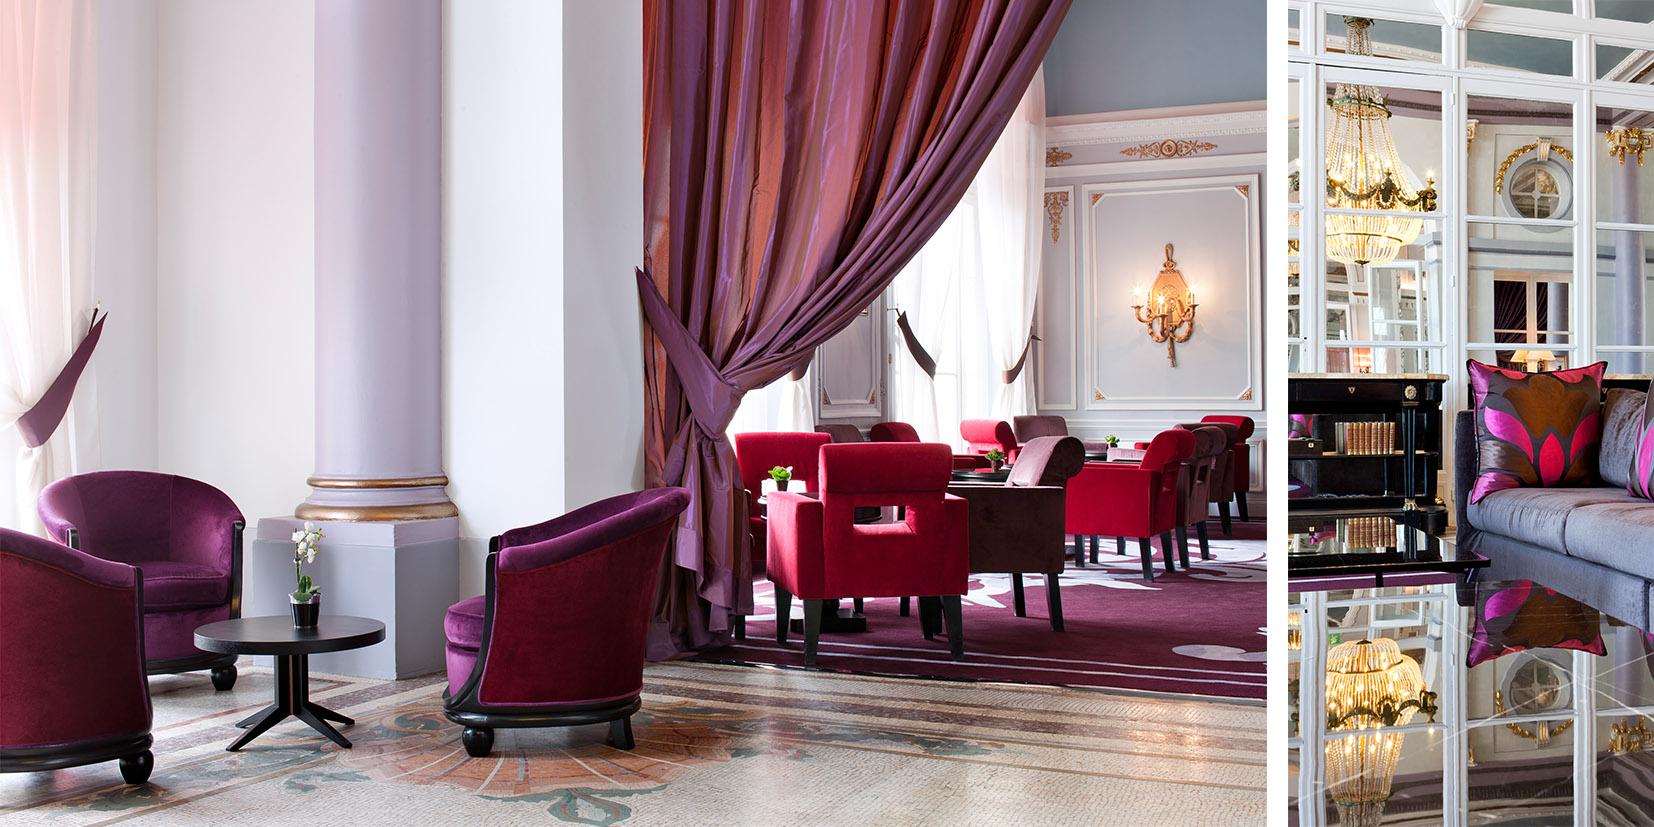 Grand Hôtel Cabourg